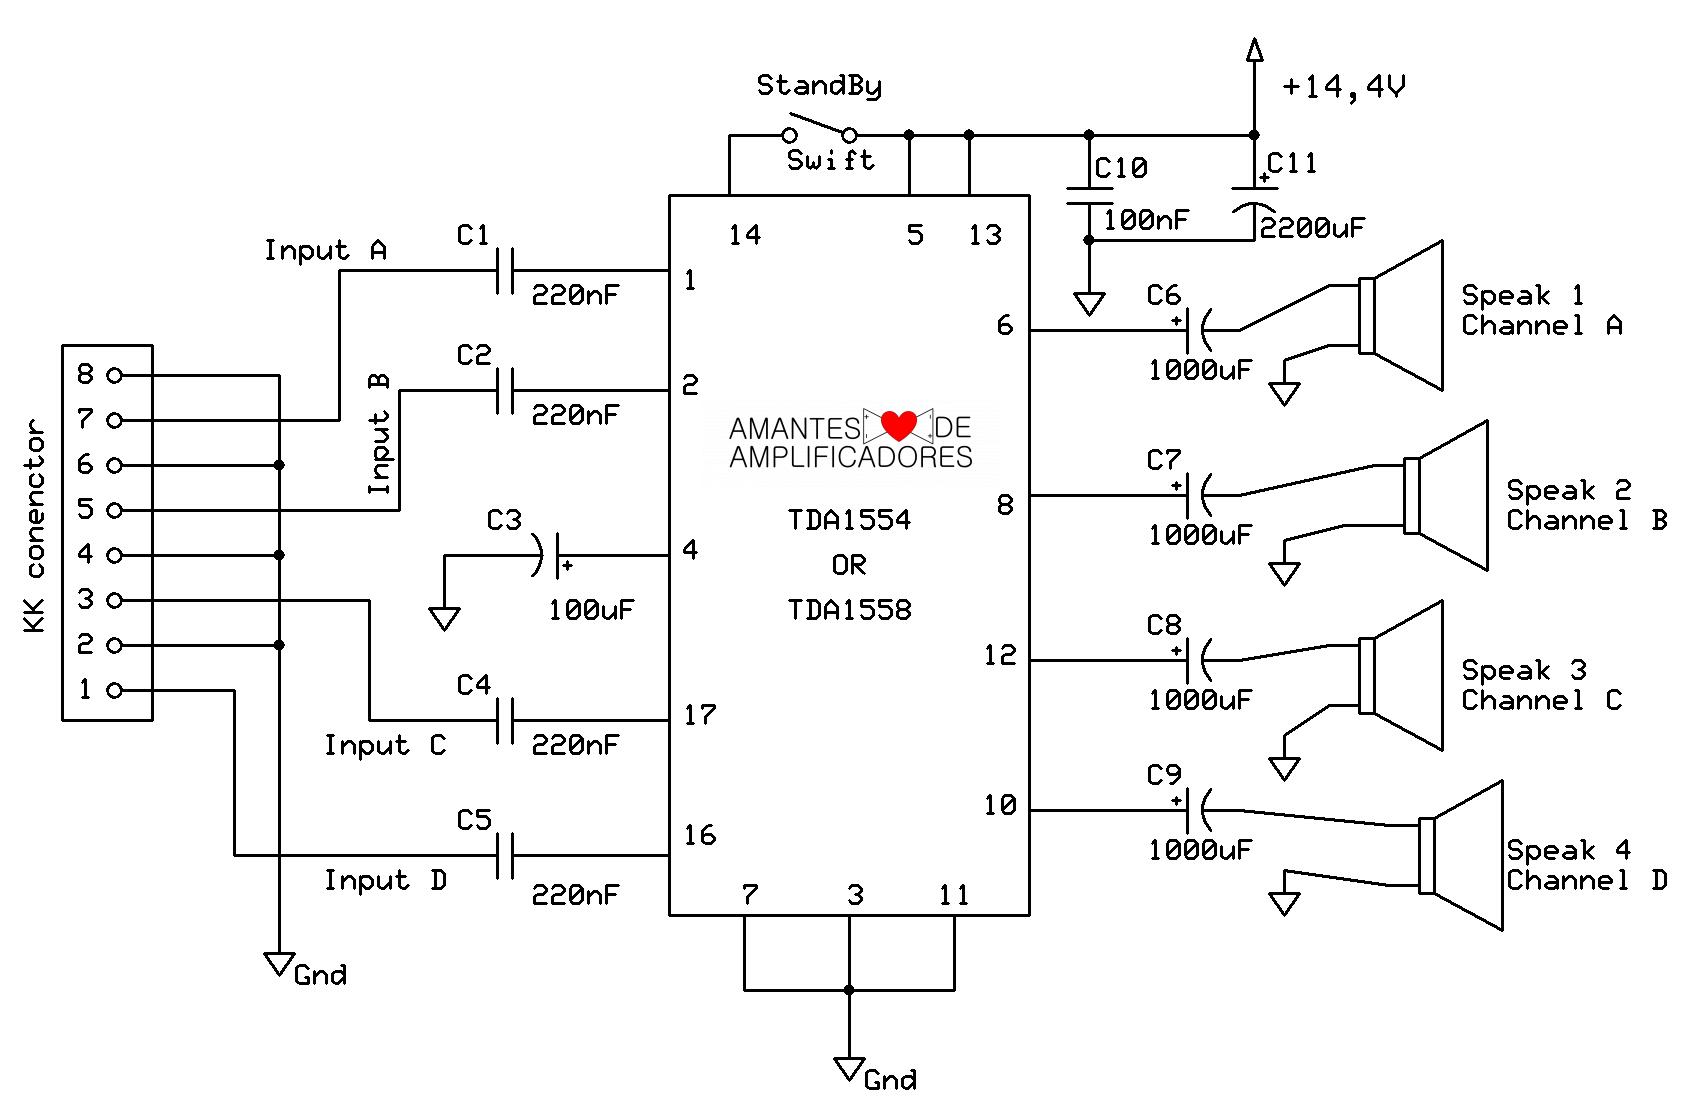 Esquema amplificador quadrifônico (4.0) de 44w de potência